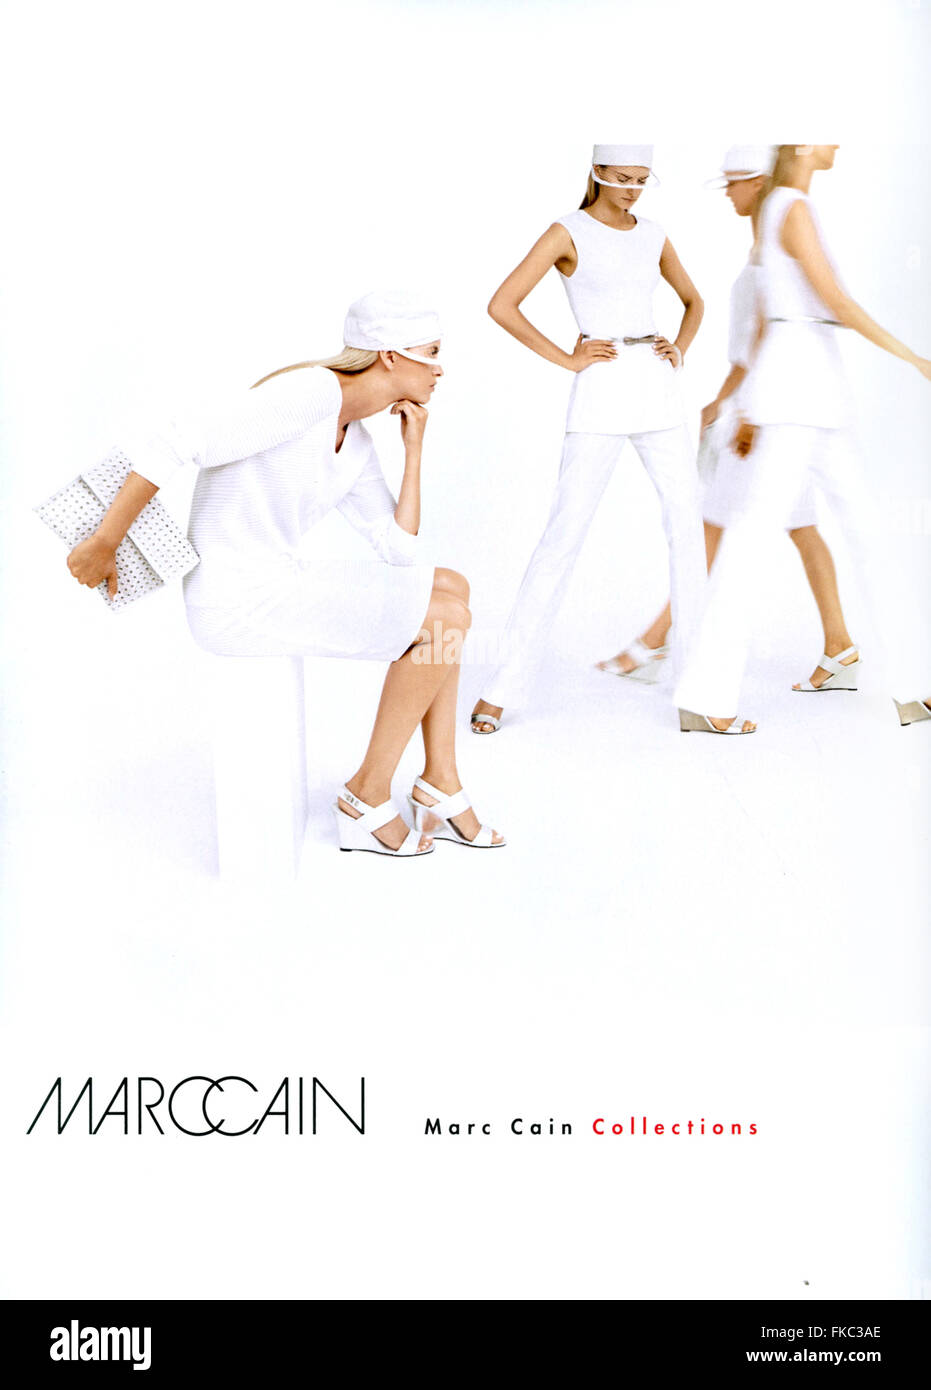 2010S UK Marc Caino Magazine annuncio pubblicitario Immagini Stock